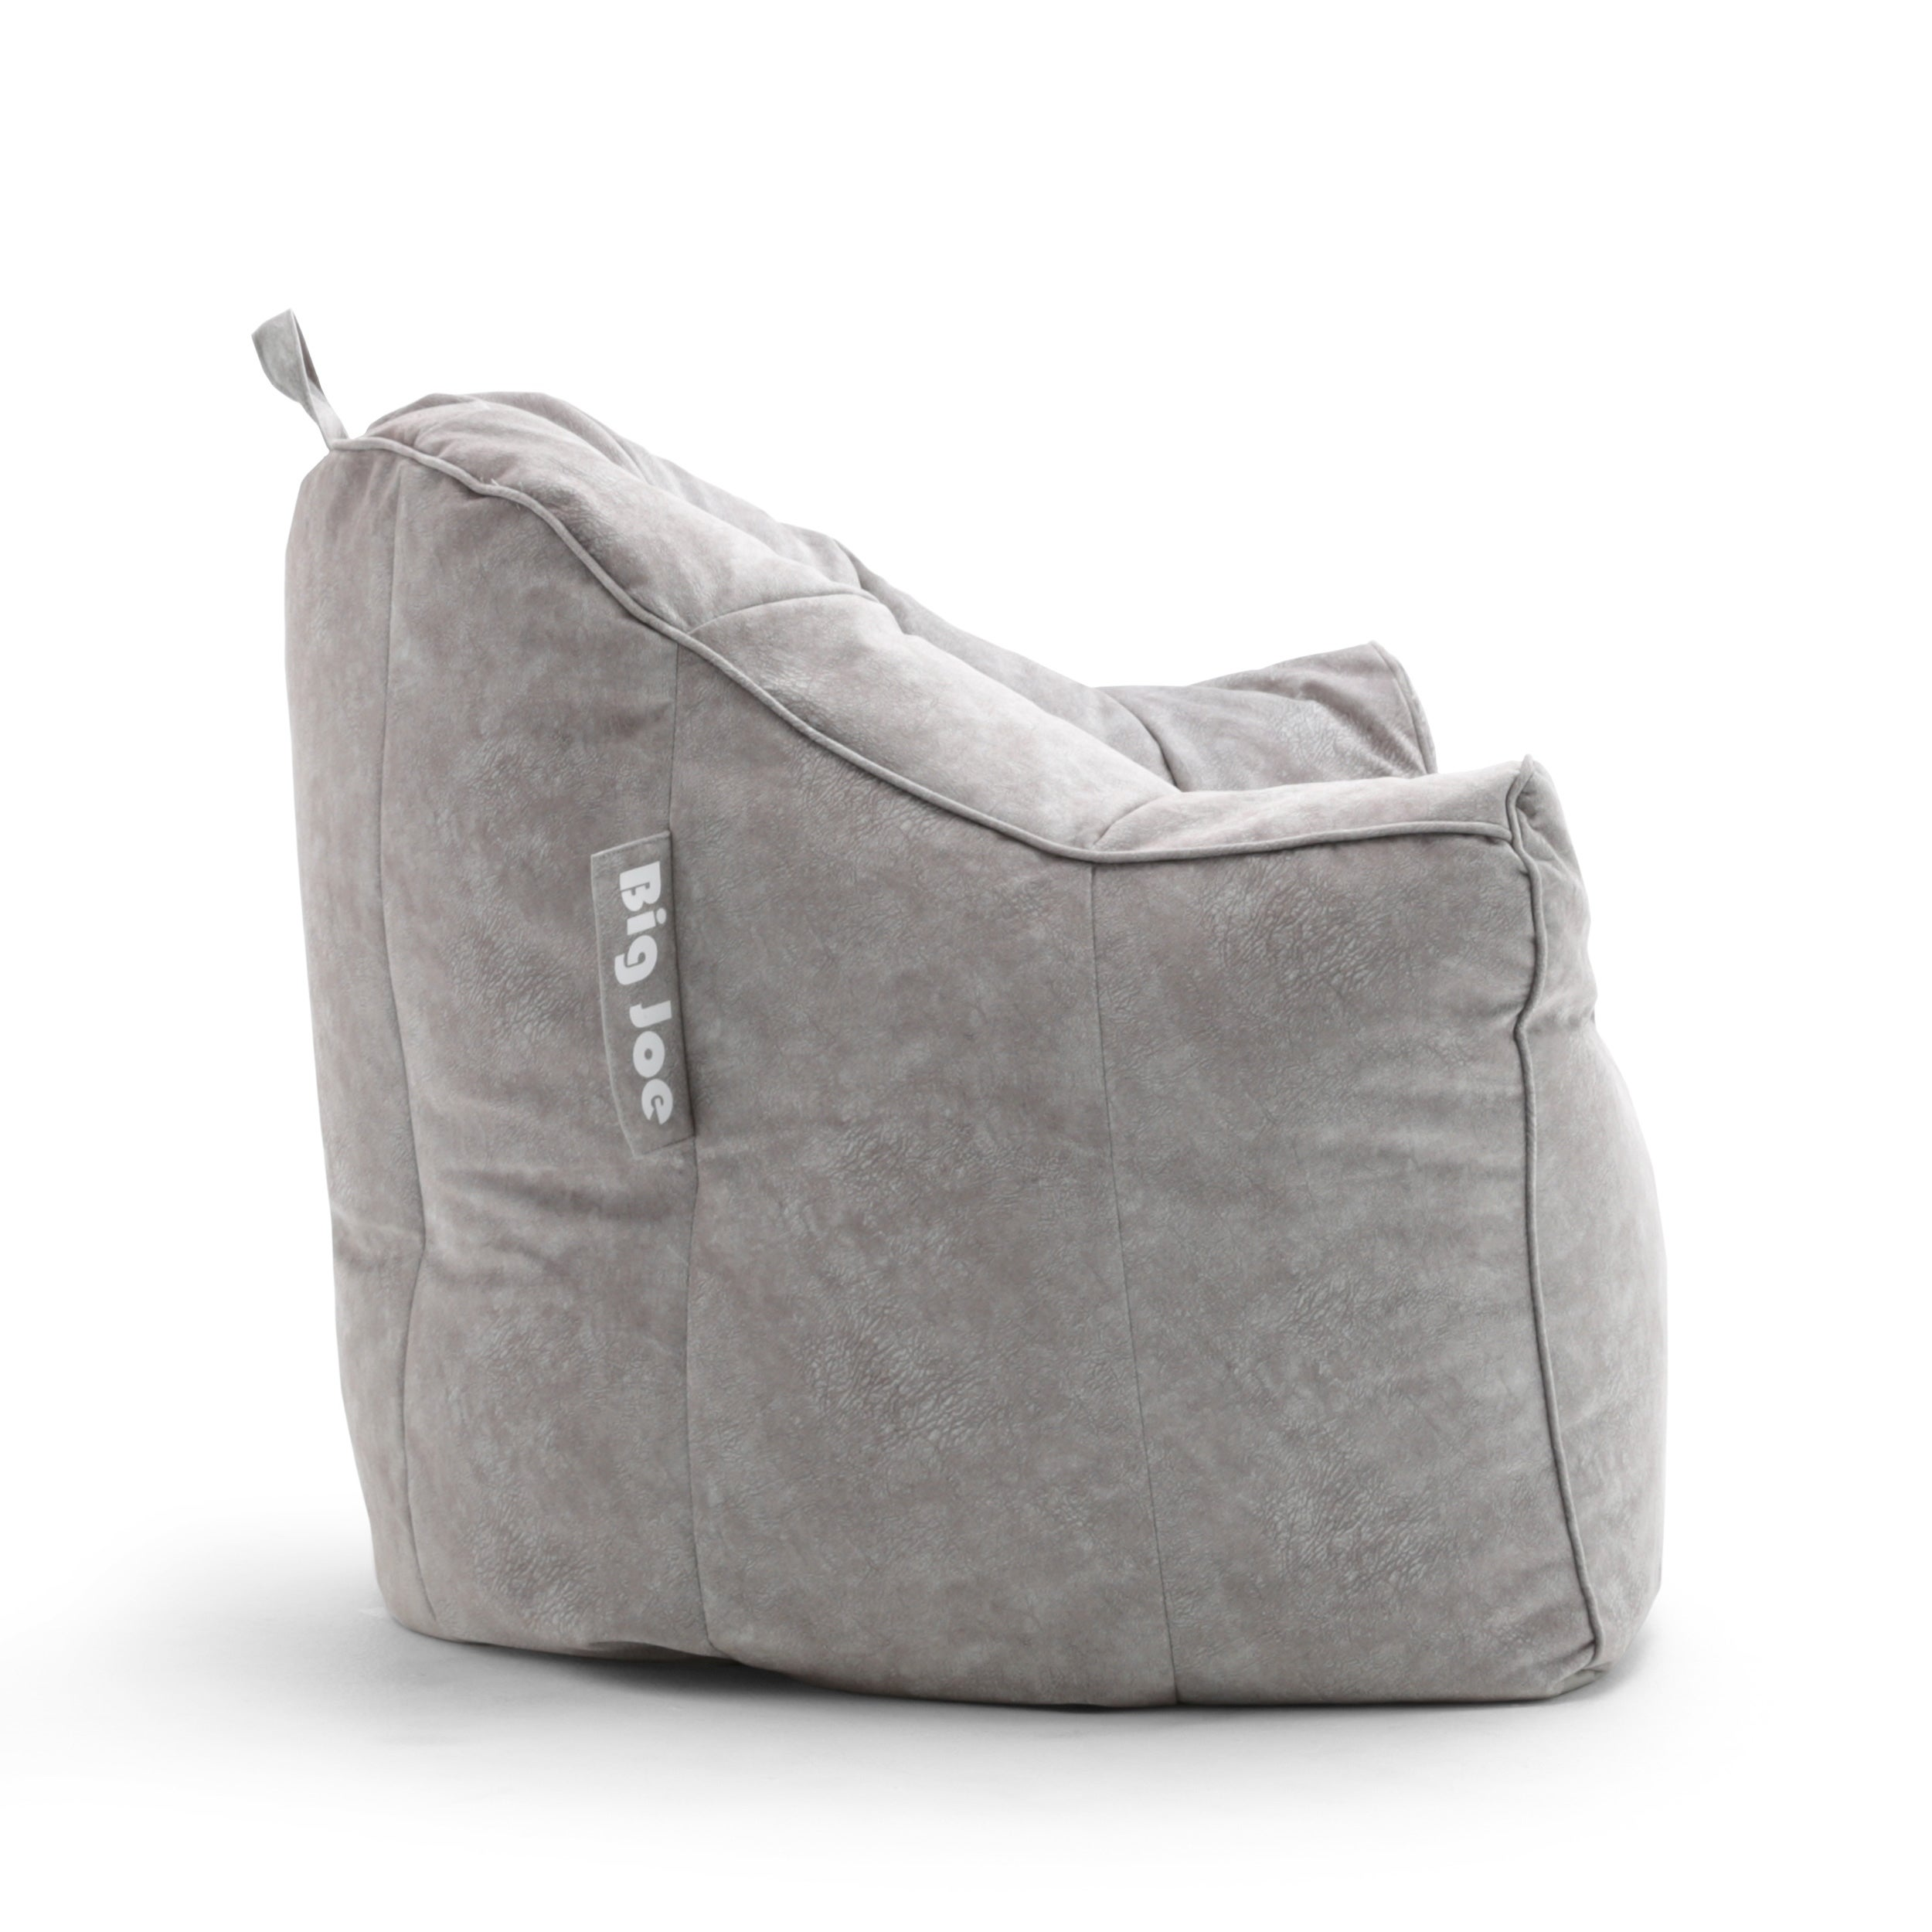 Shop Big Joe Hug Bean Bag Chair   Free Shipping Today   Overstock.com    19759199